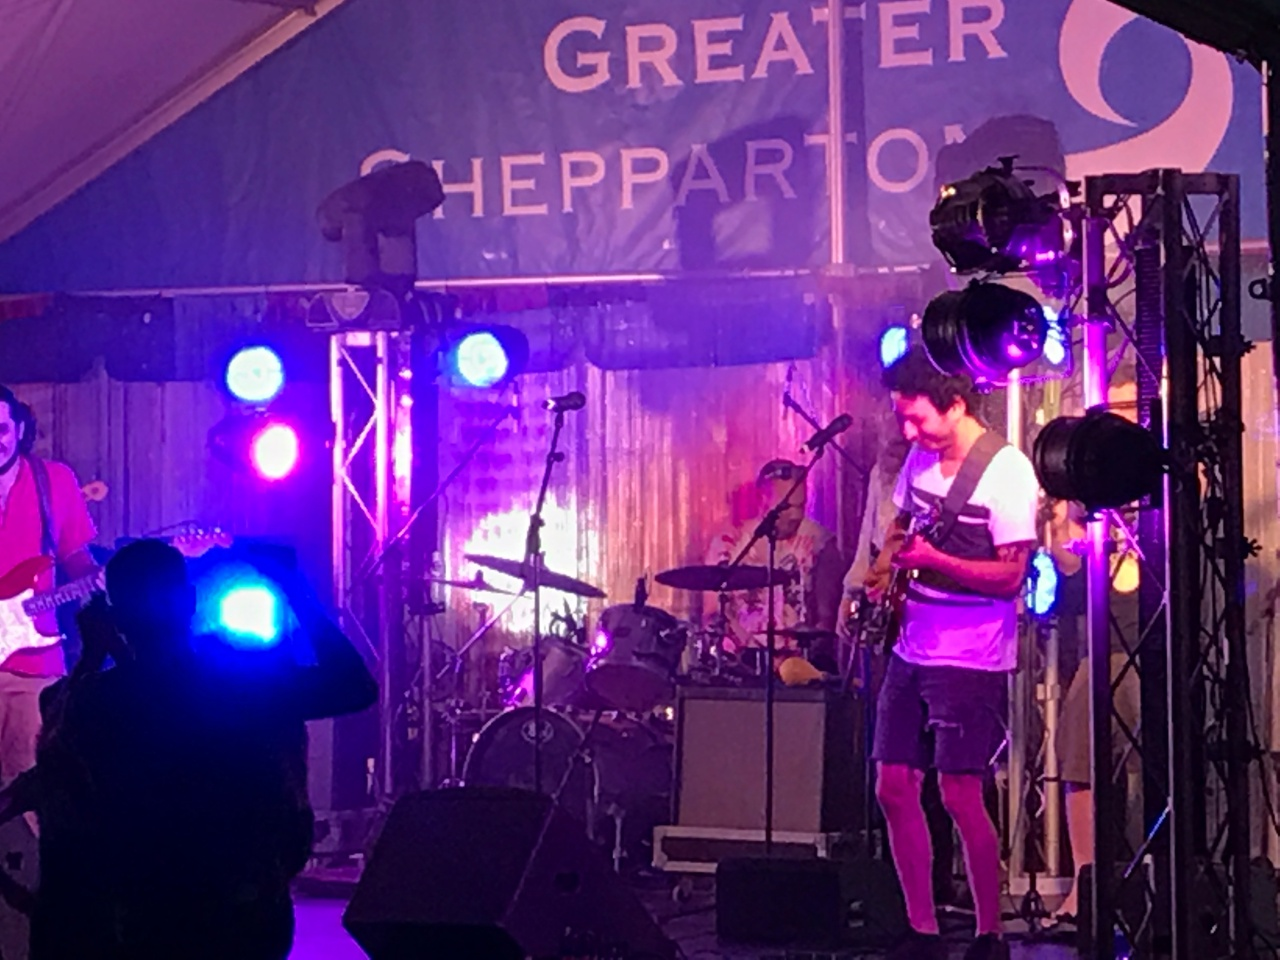 Converge on the Goulburn – a multicultural festival inShepparton